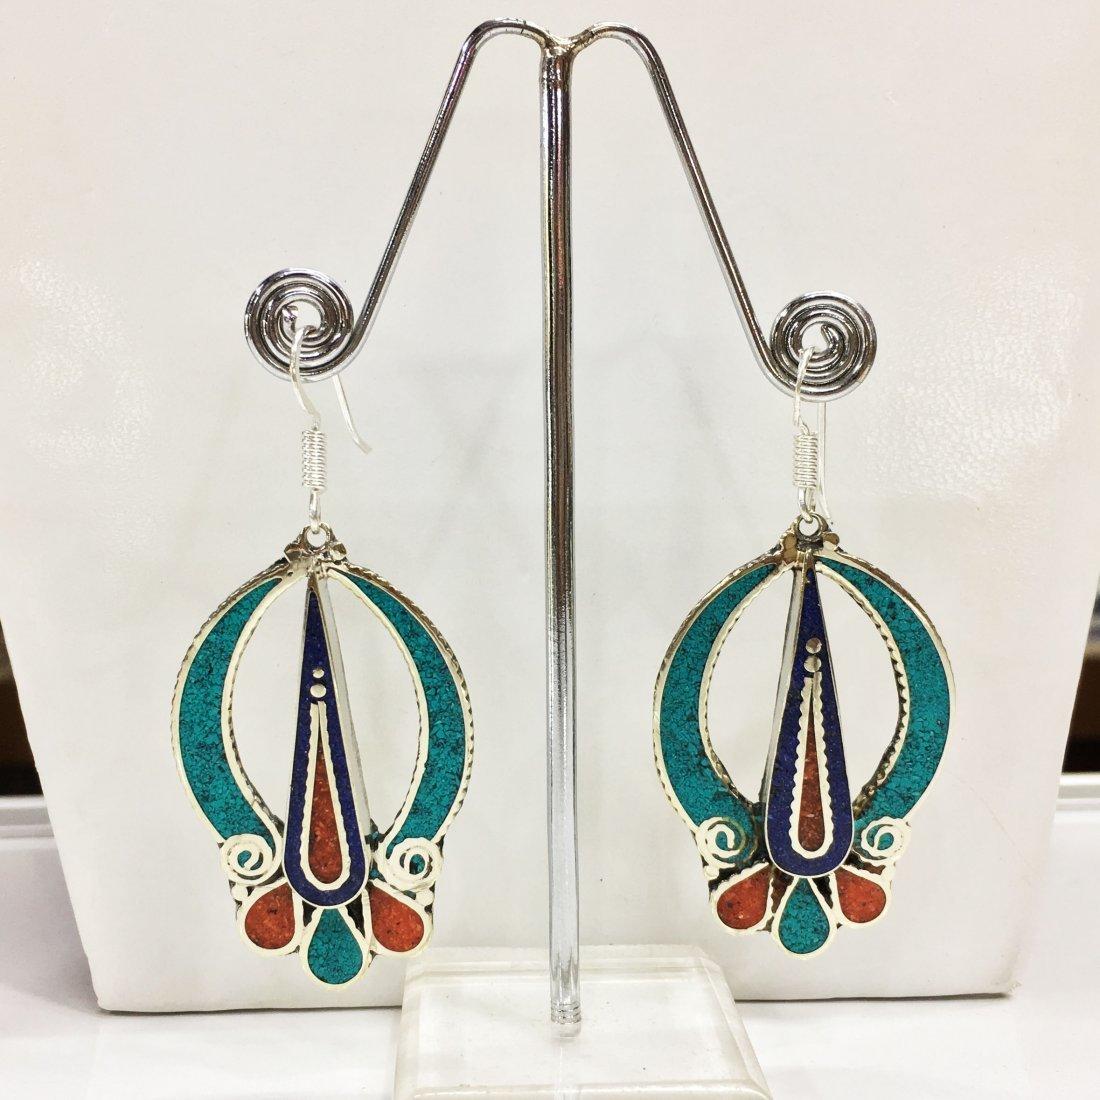 Vintage Turquoise & Coral Tibetan Handmade Earring